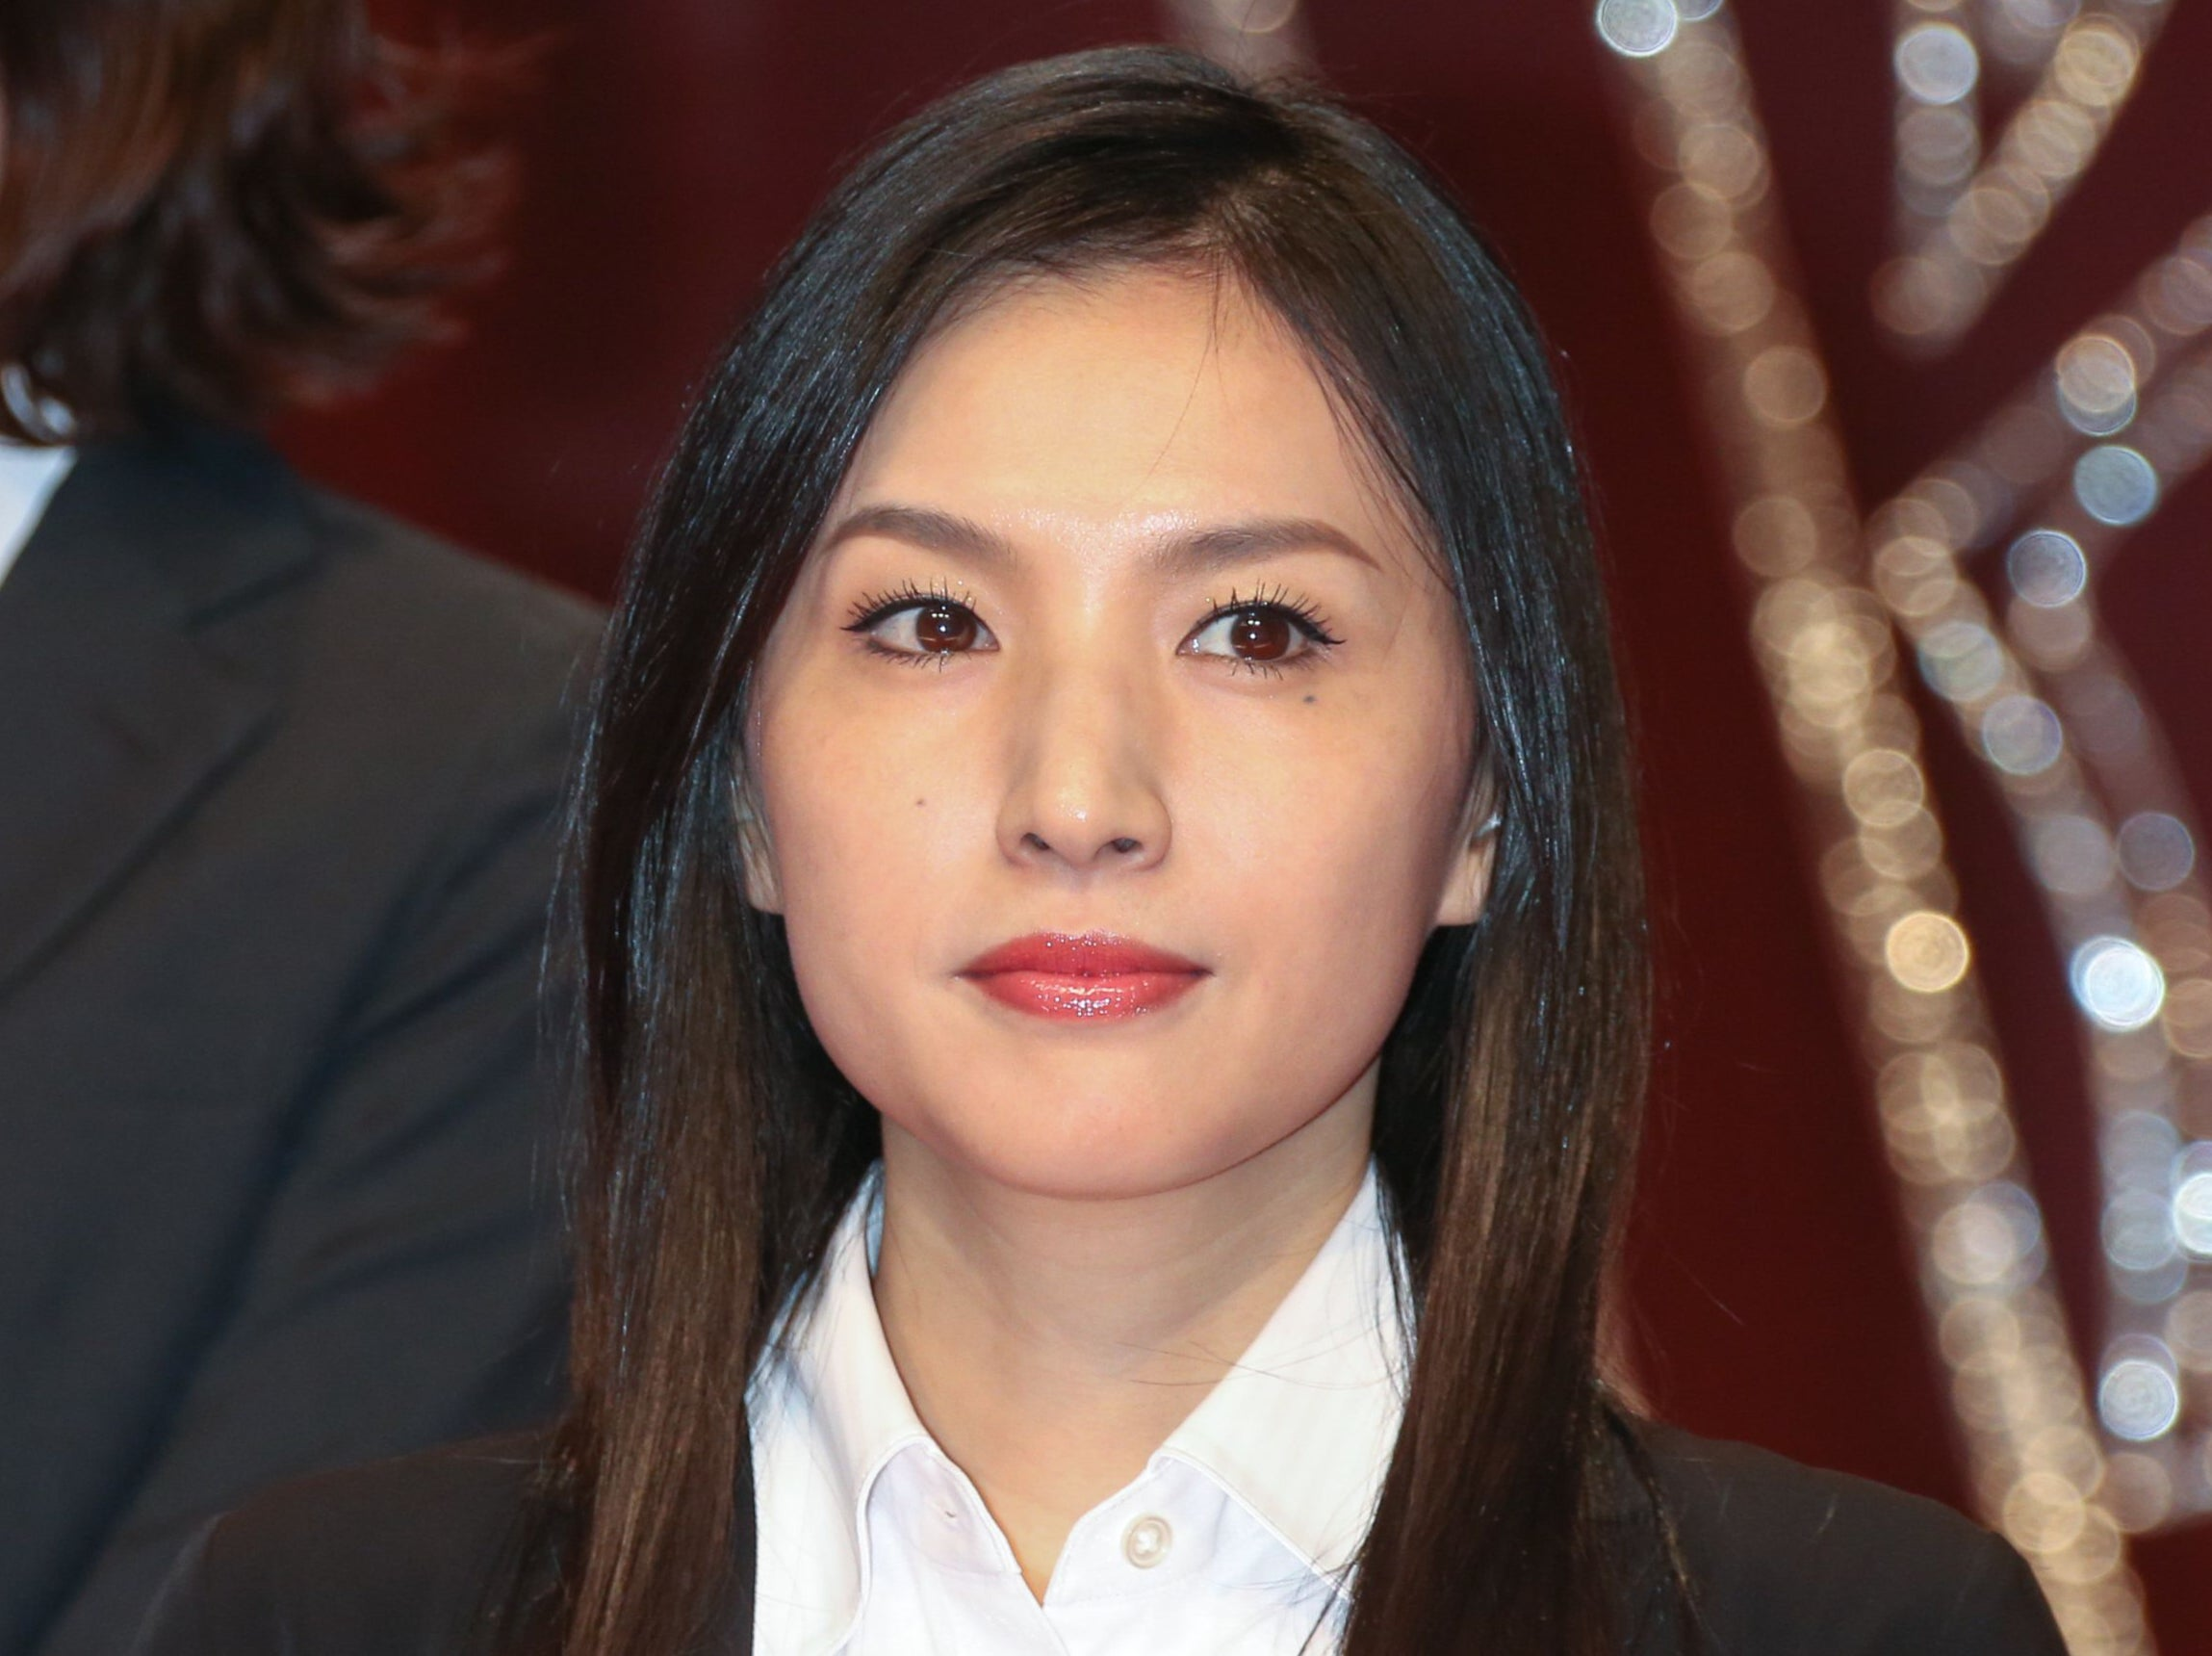 Japanese actor Sei Ashina dies aged 36